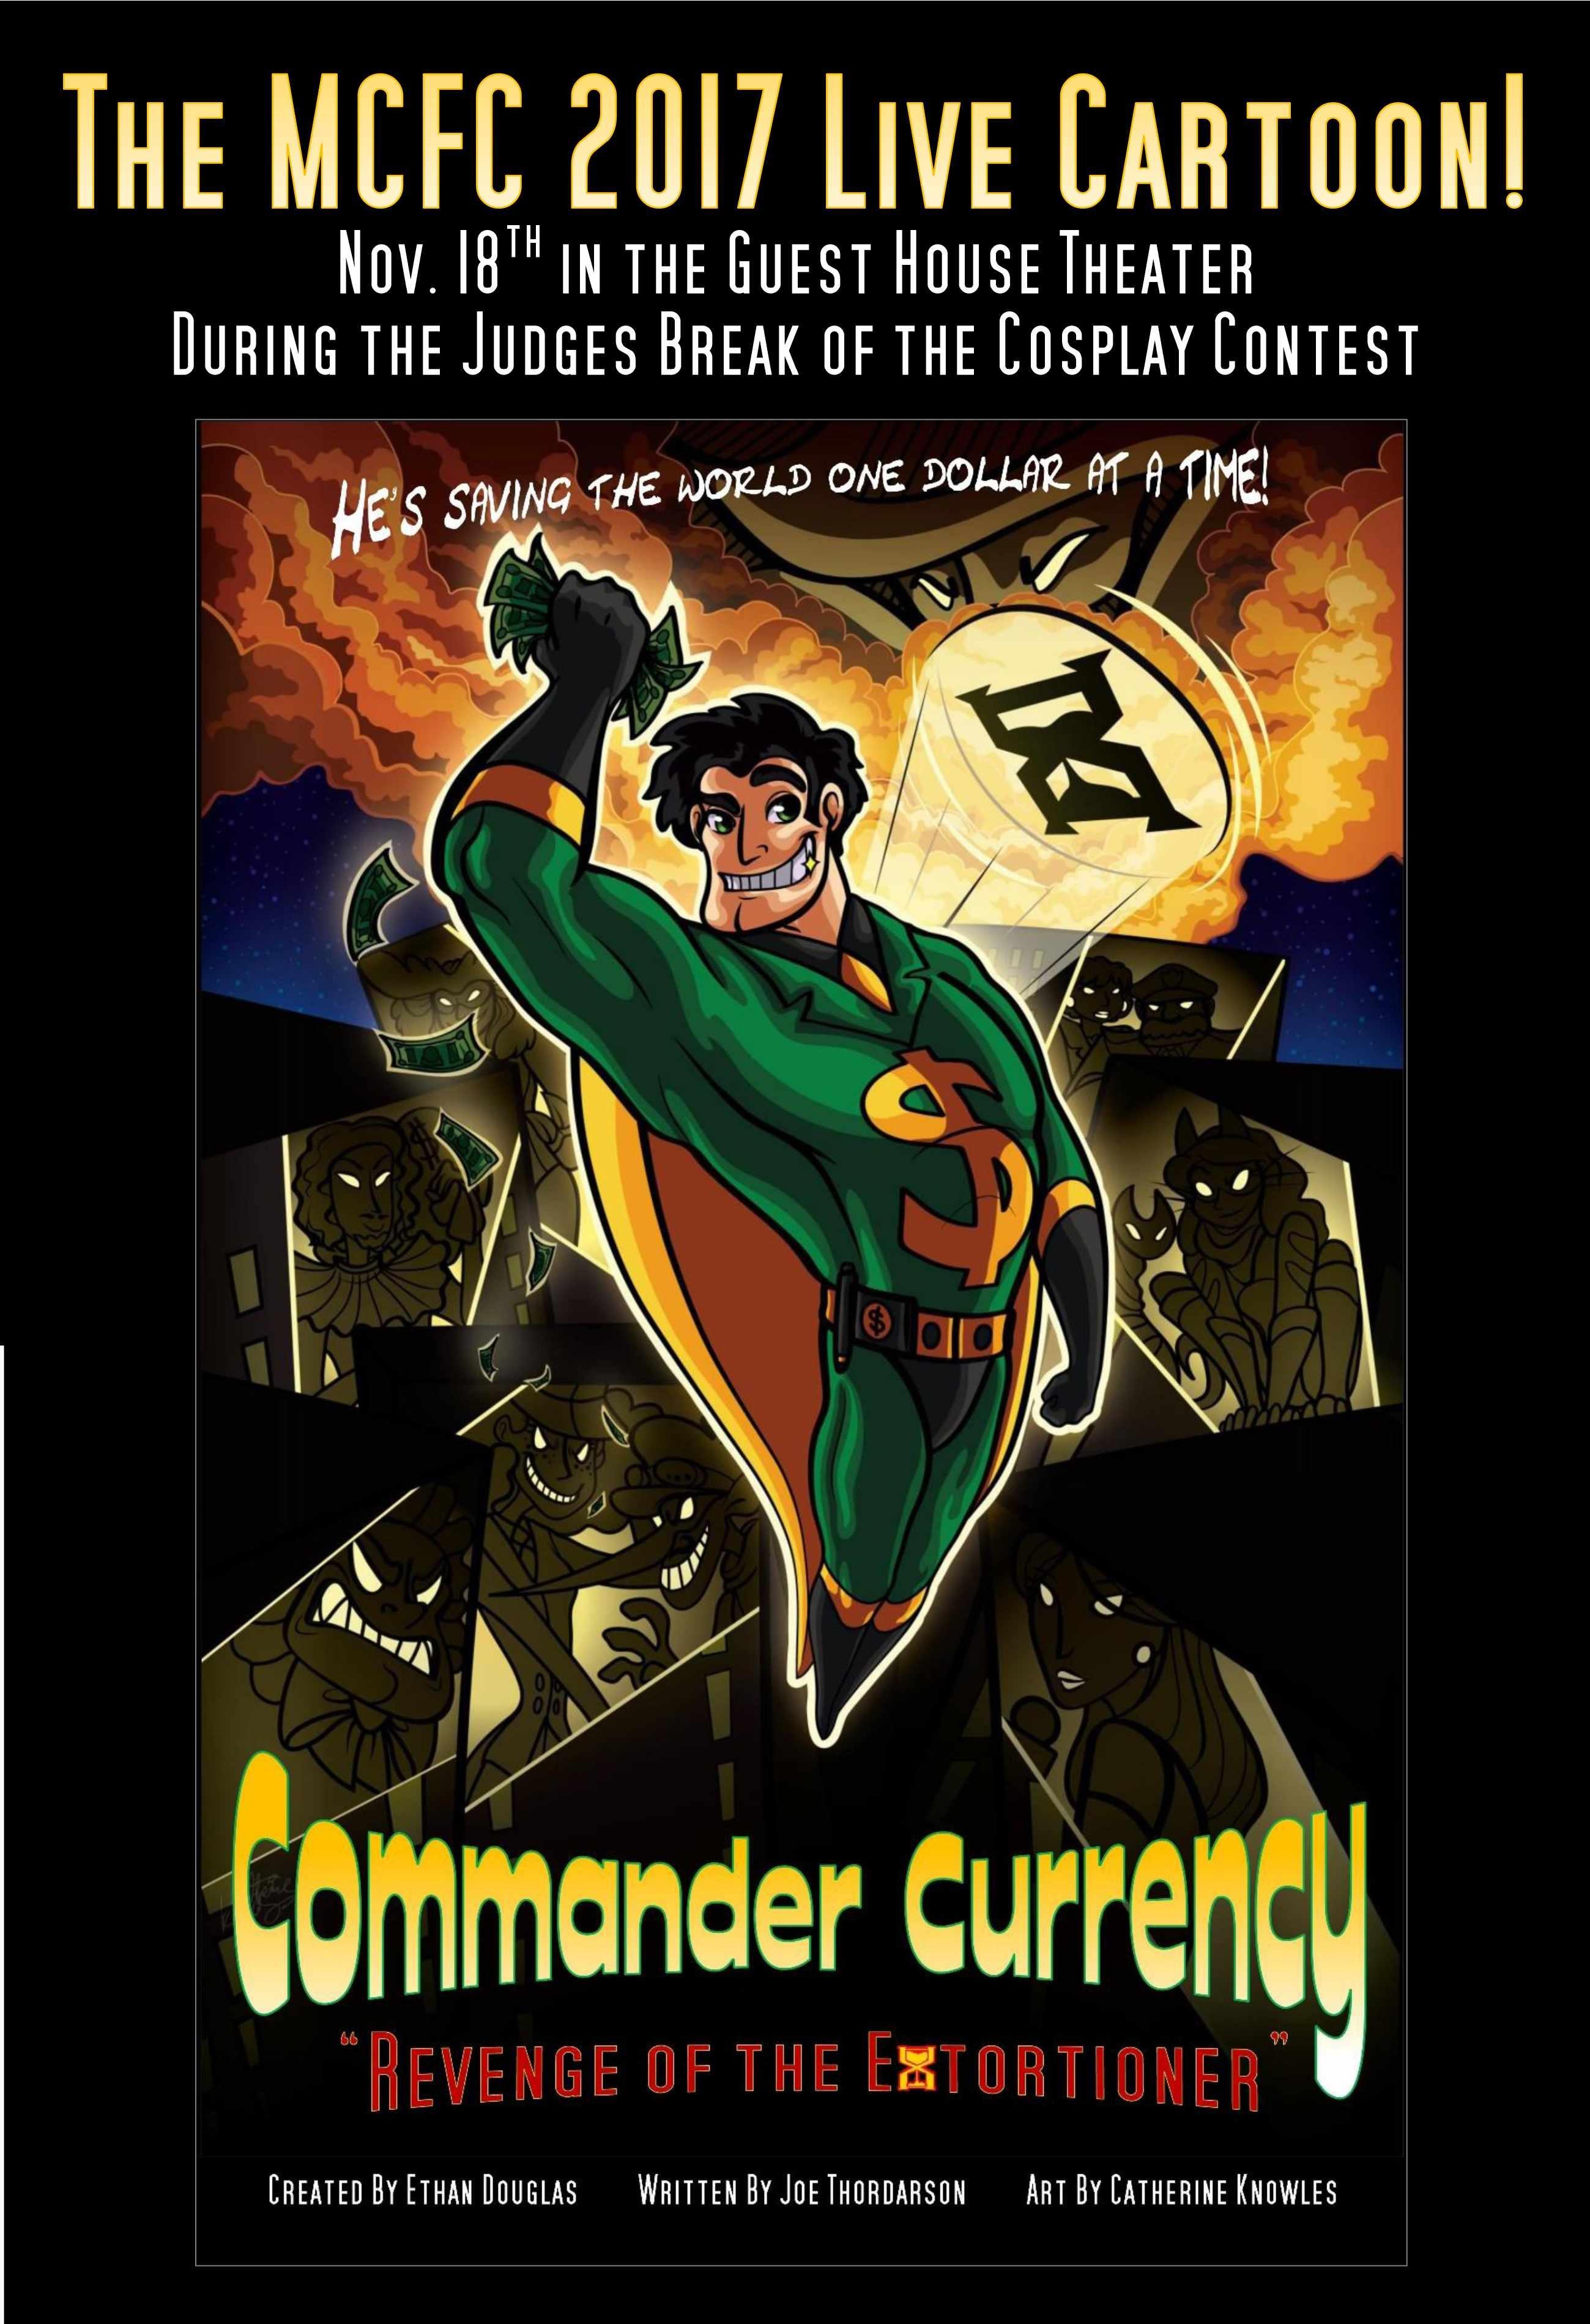 CC Live Cartoon 2017 Poster._001